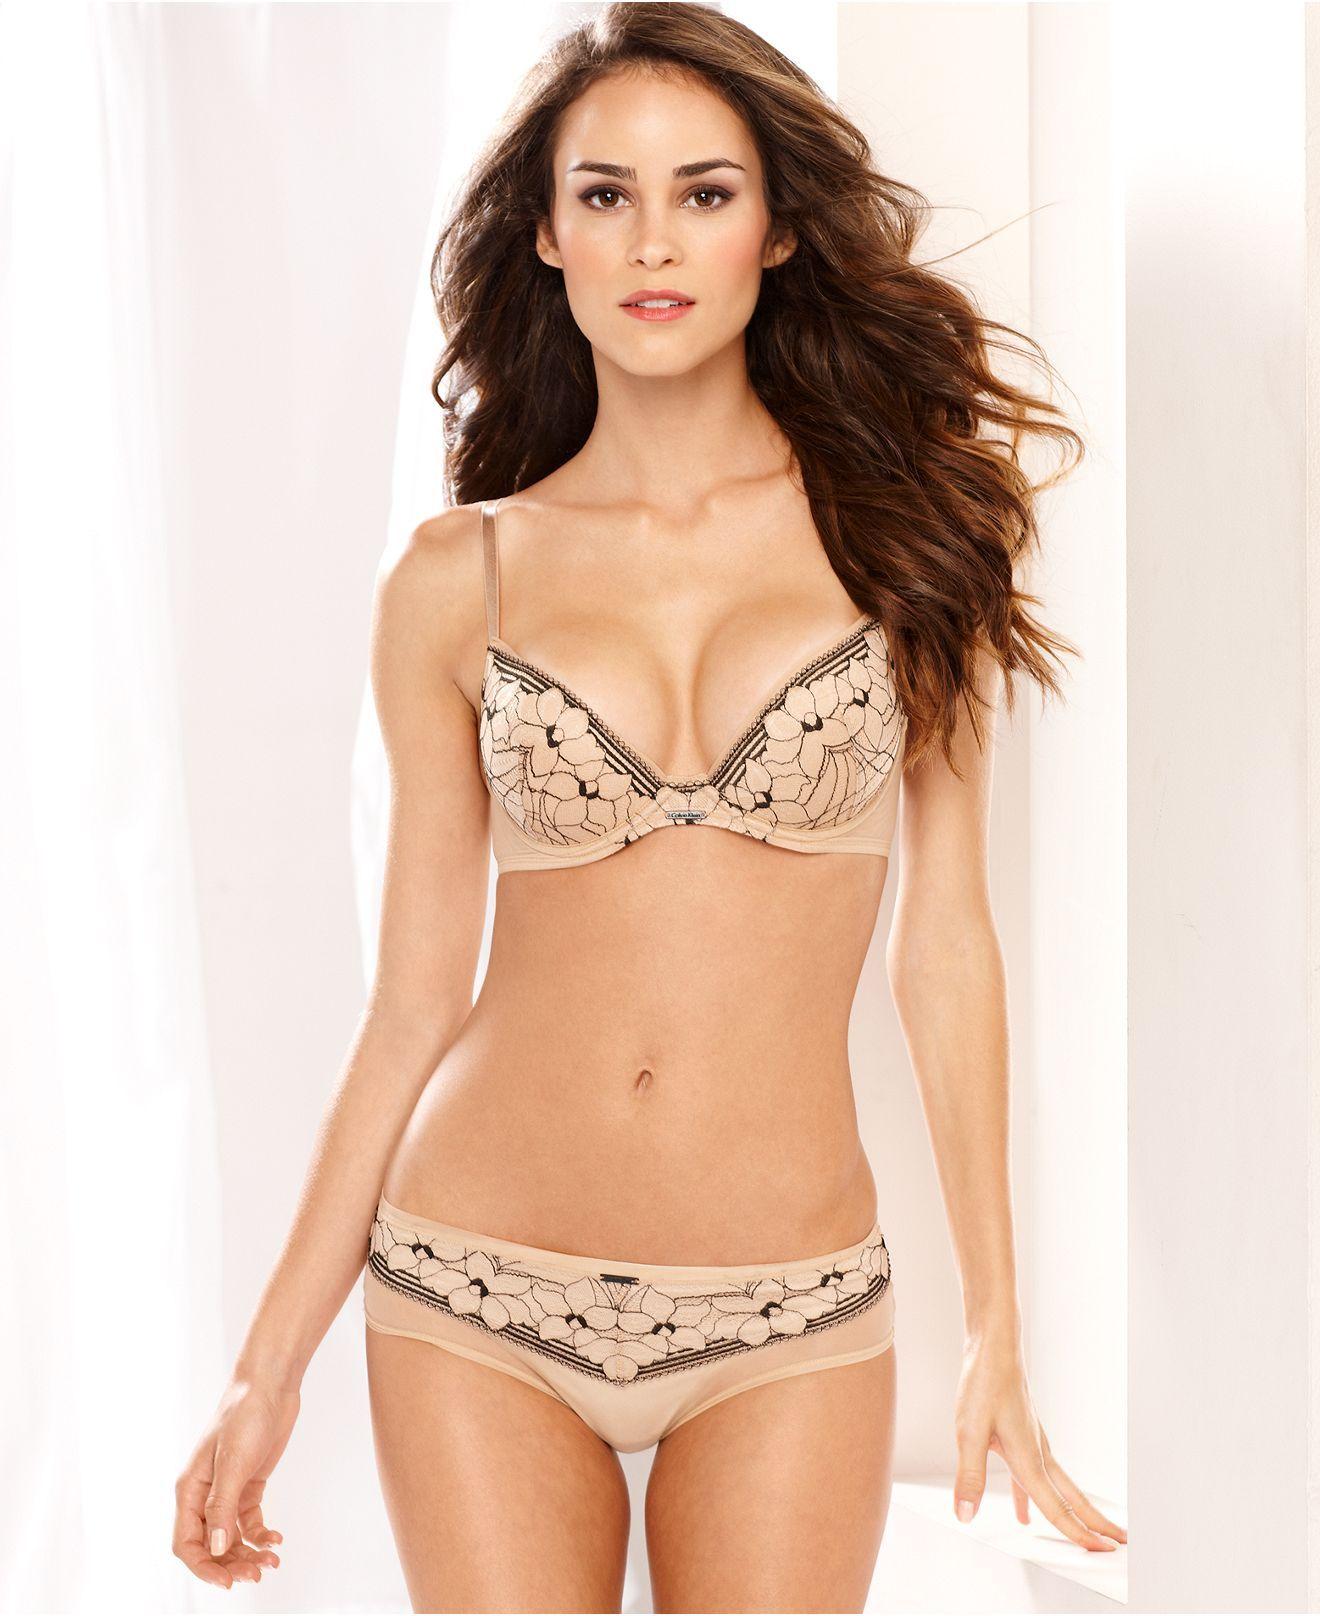 Matching bra & panty sets (any brand)- TJ MAXX, Marshalls ...